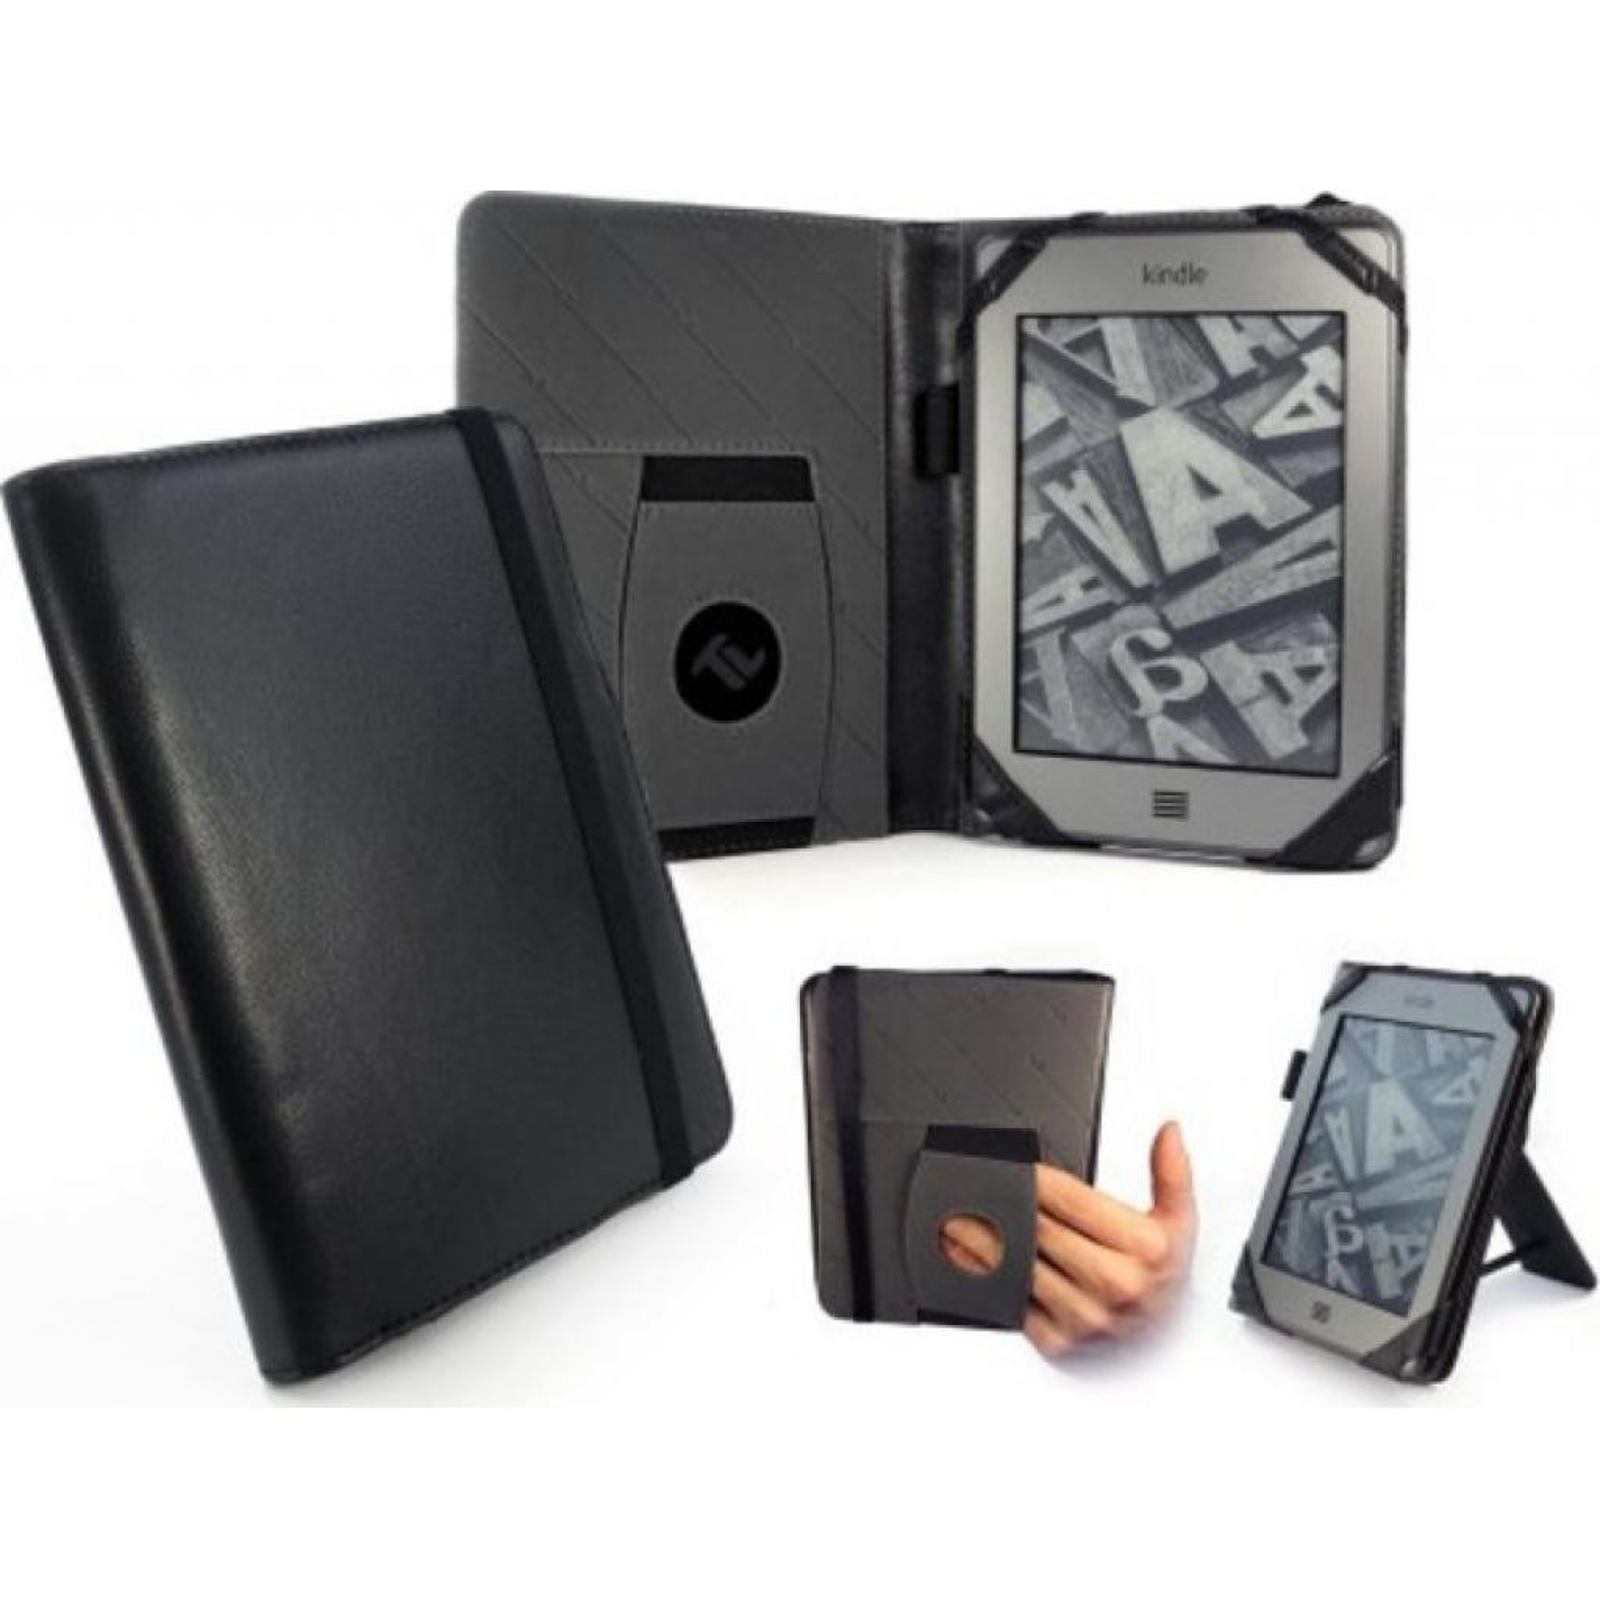 Чехол для электронной книги Tuff-Luv 6 Embrace Plus Leather Napa Black (A10_40) изображение 6